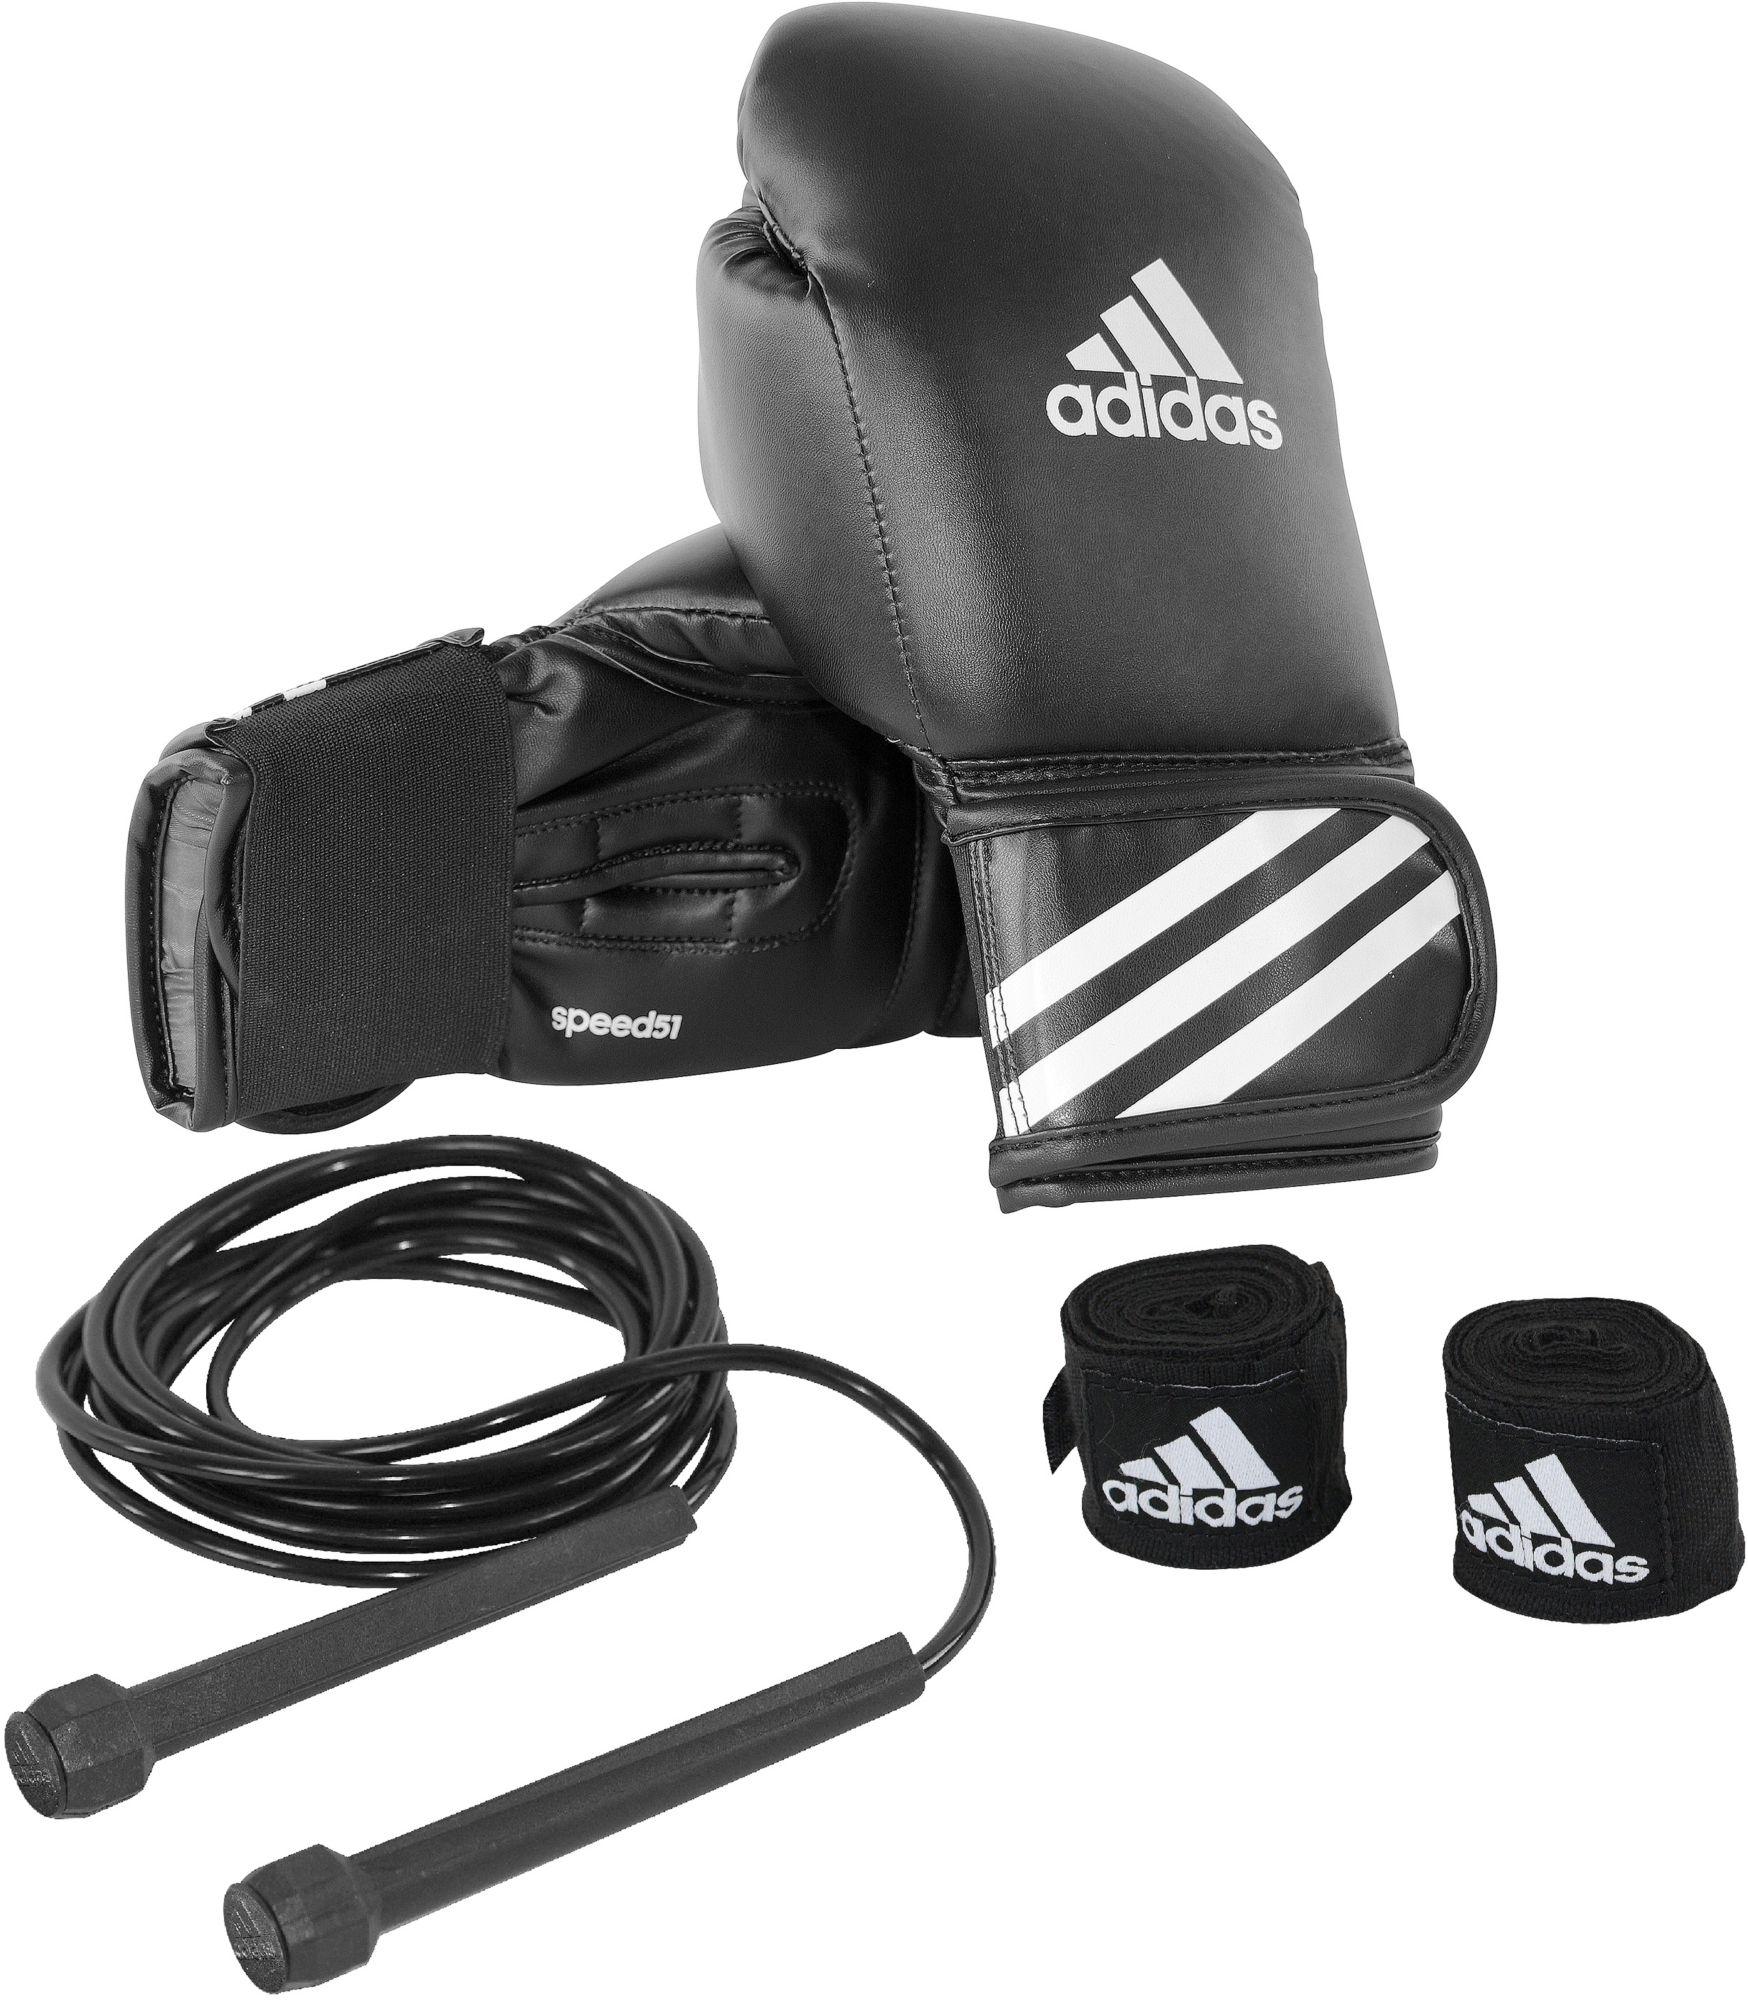 ADIDAS PERFORMANCE adidas Performance Boxhandschuhe mit Springseil und Bandagen, »Boxing Kit«